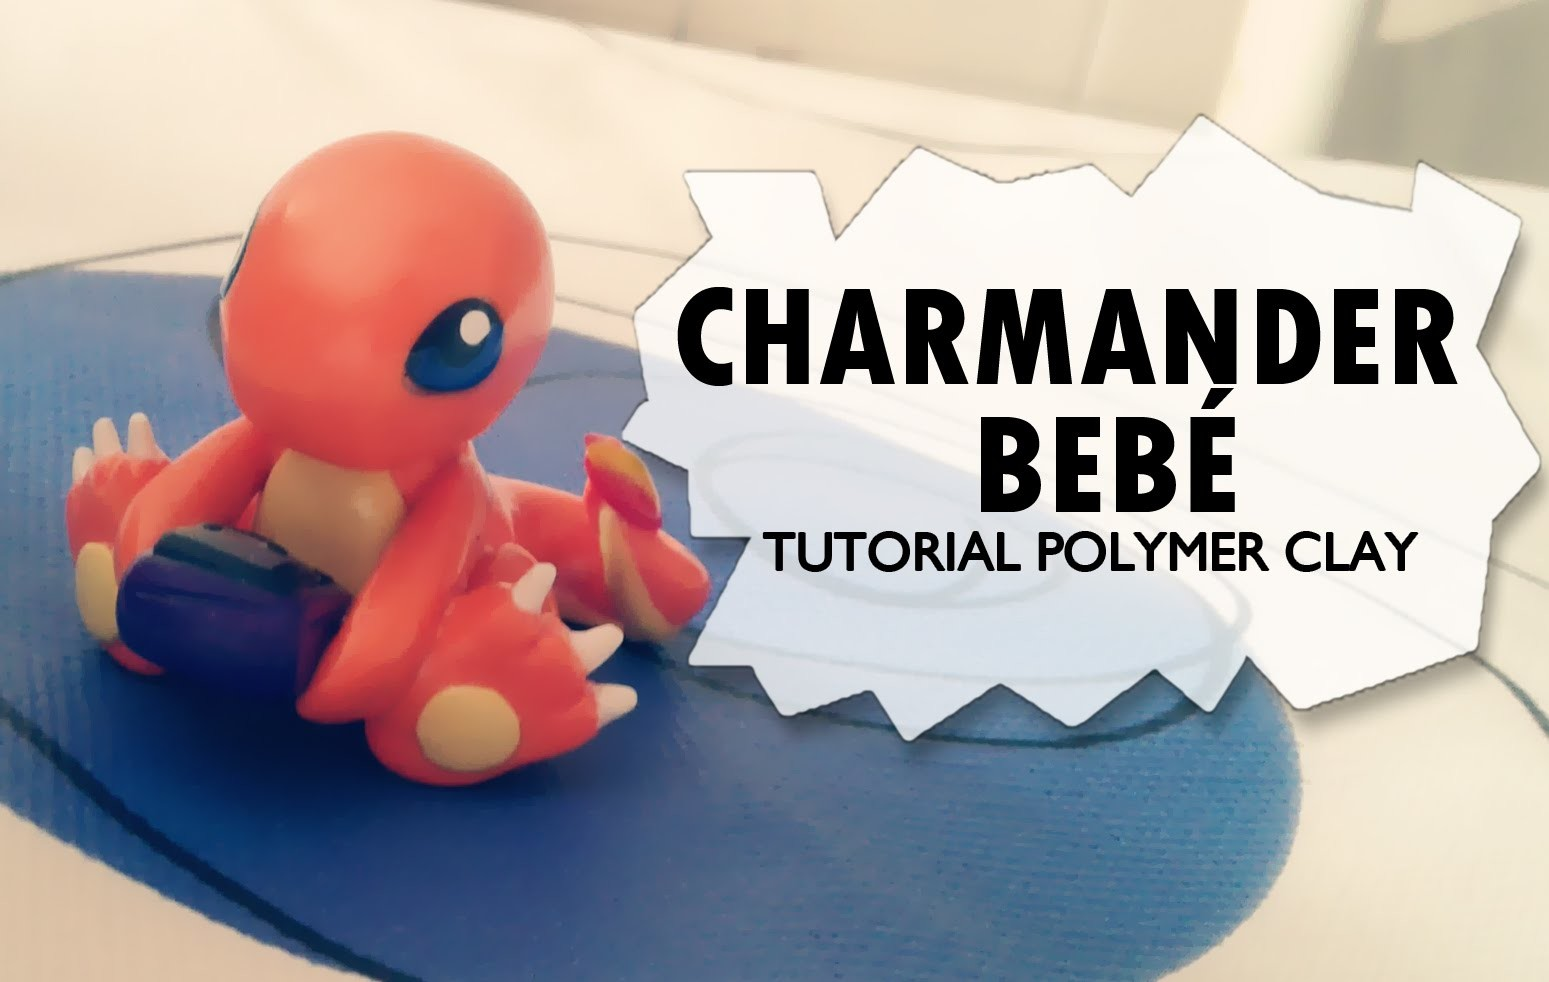 Baby Charmander Polymer Clay Tutorial. Charmander Bebé